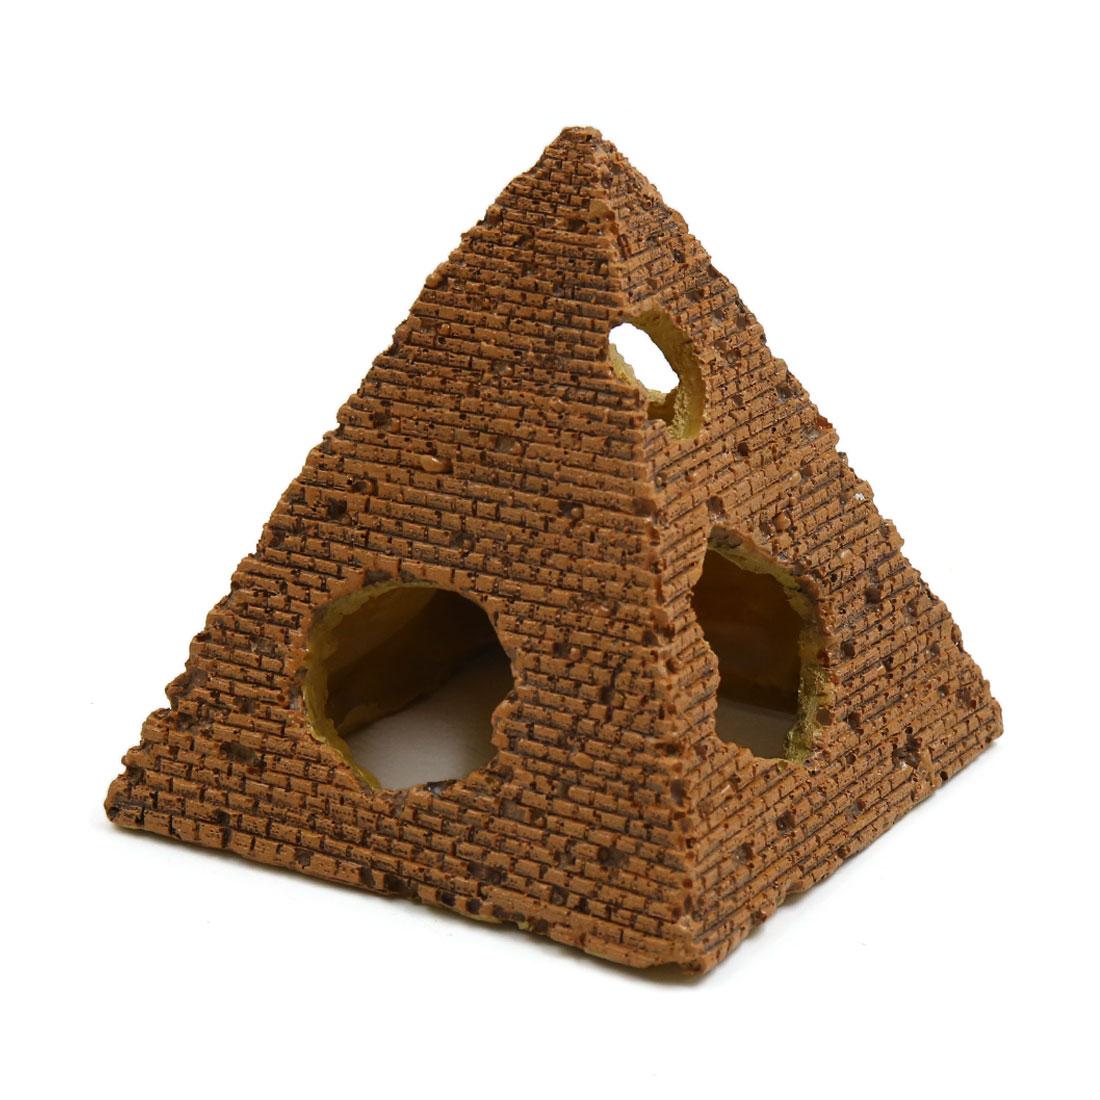 Resin Pyramid Shaped Aquarium Betta Tank Decor Fish Shrimp Shelter Ornament L